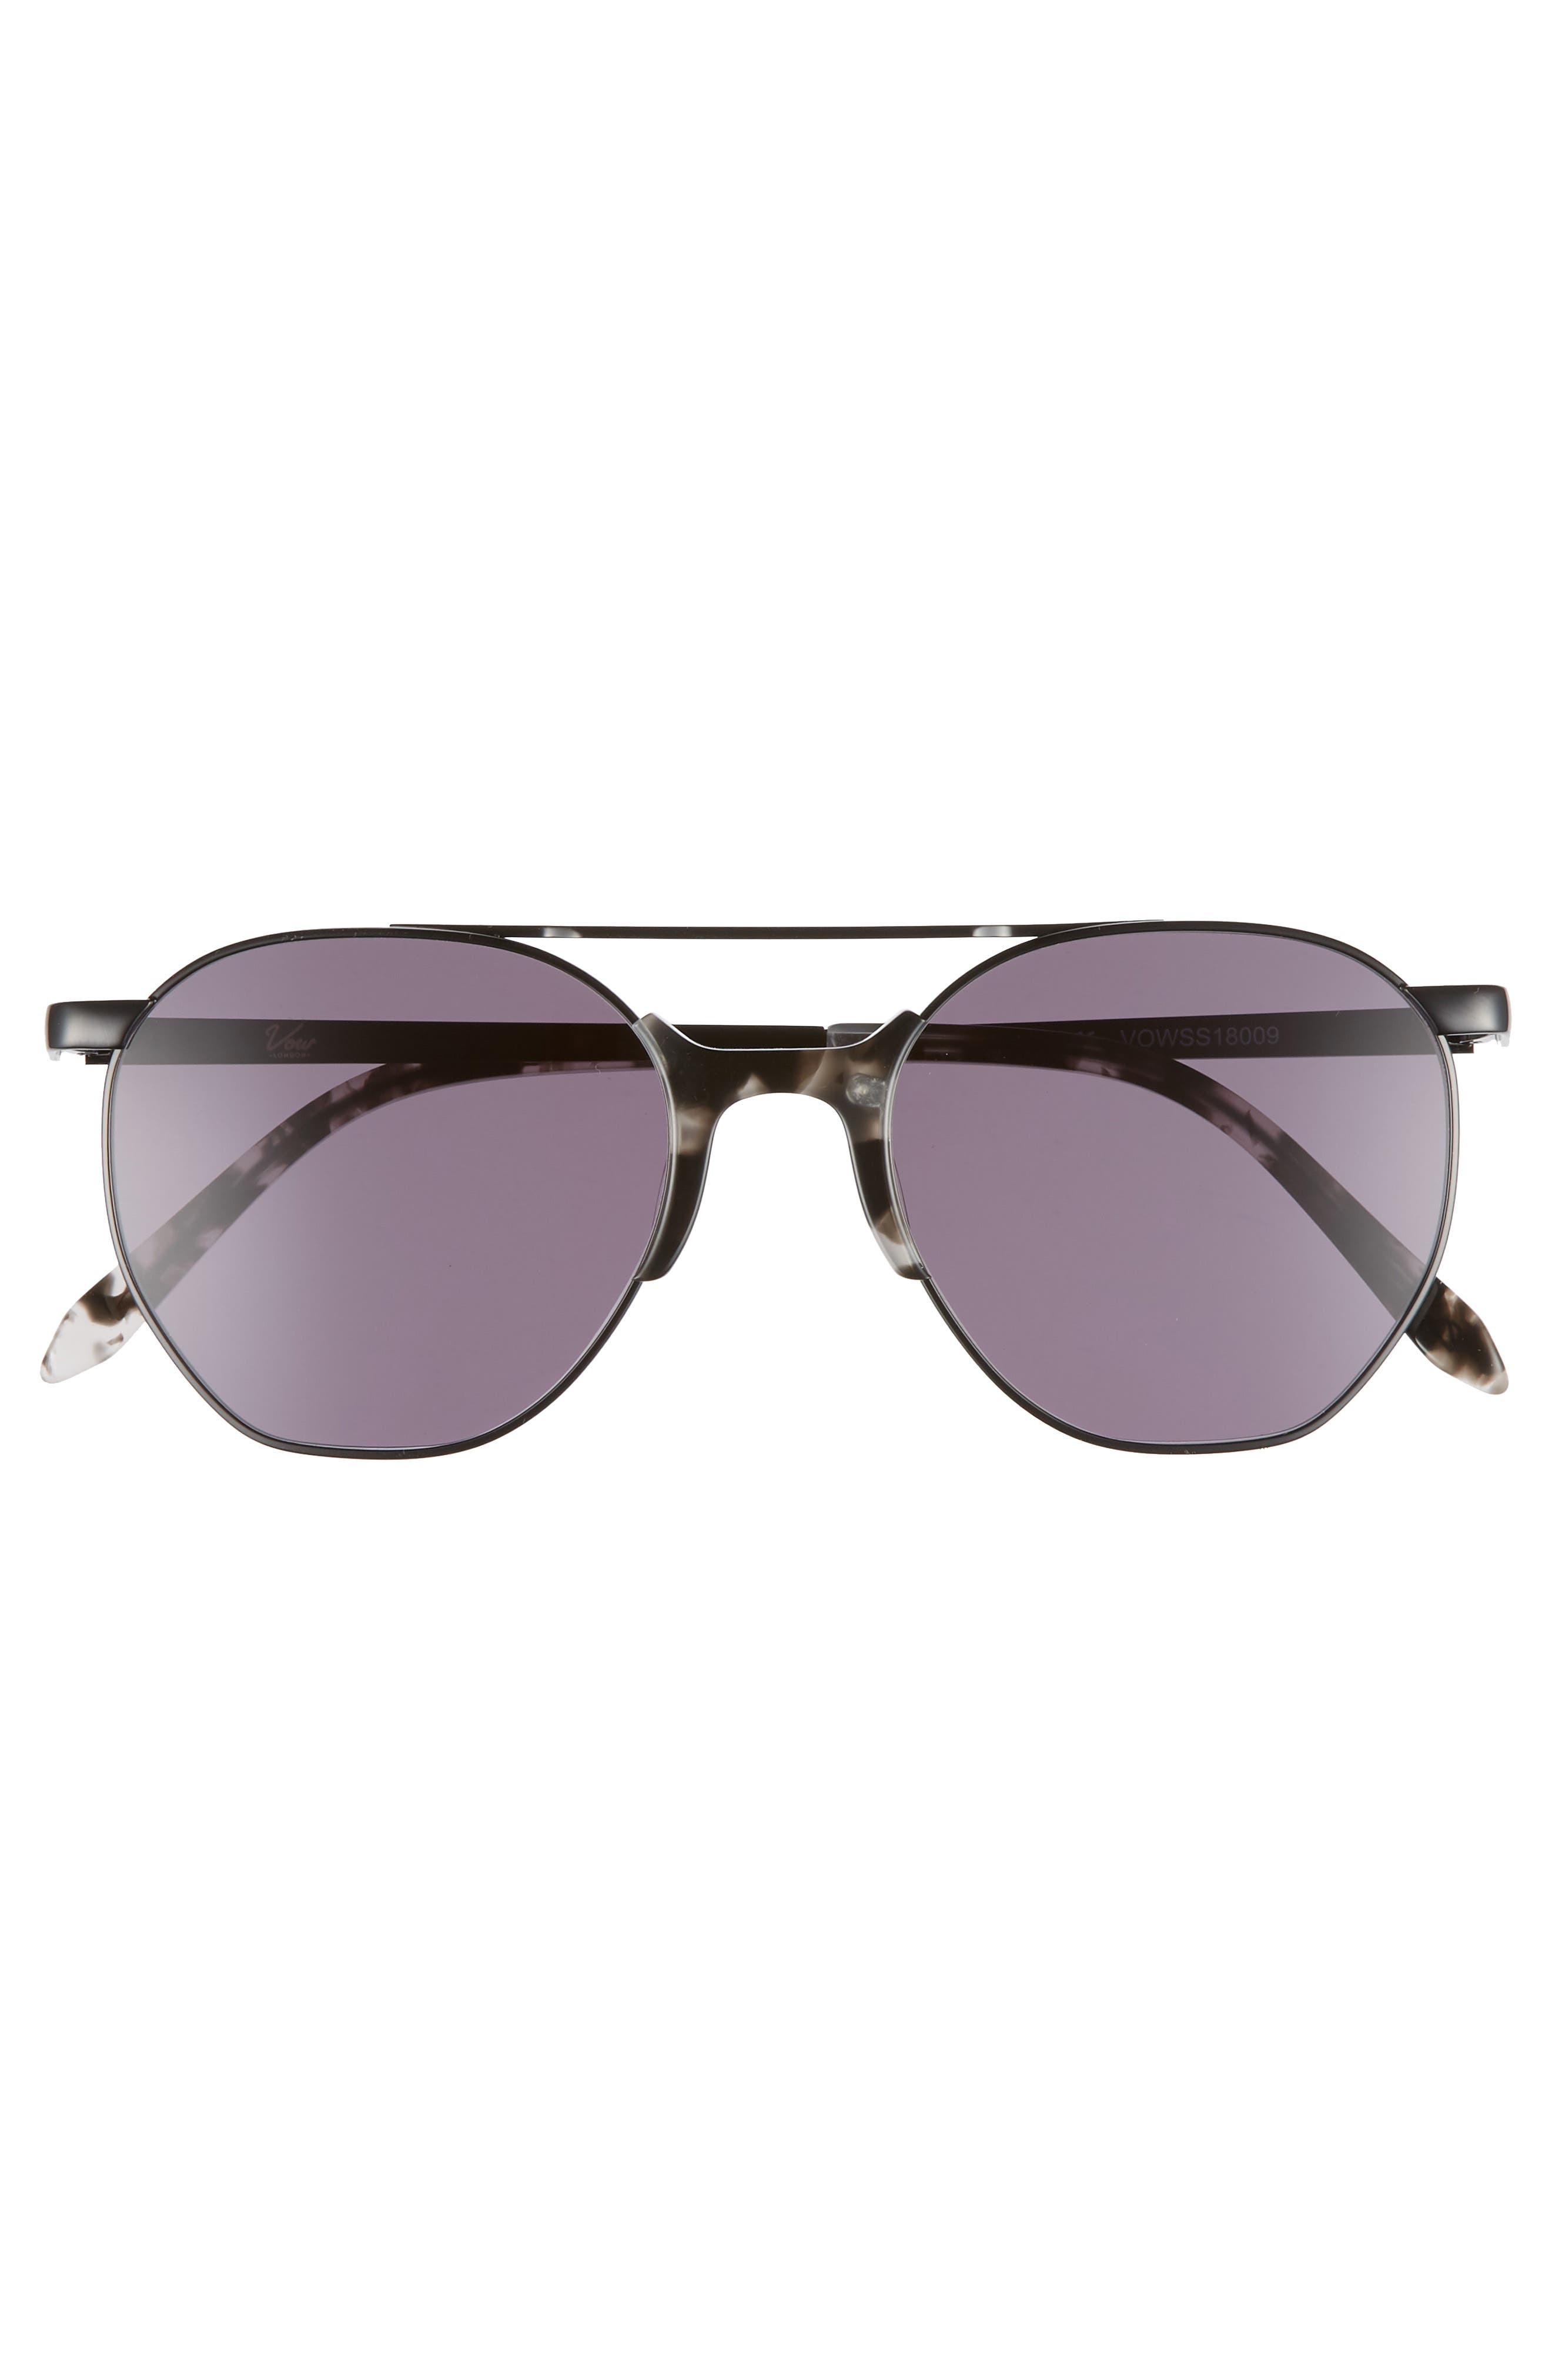 Raine 52mm Aviator Sunglasses,                             Alternate thumbnail 3, color,                             SMOKE TORTOISE/ BLACK